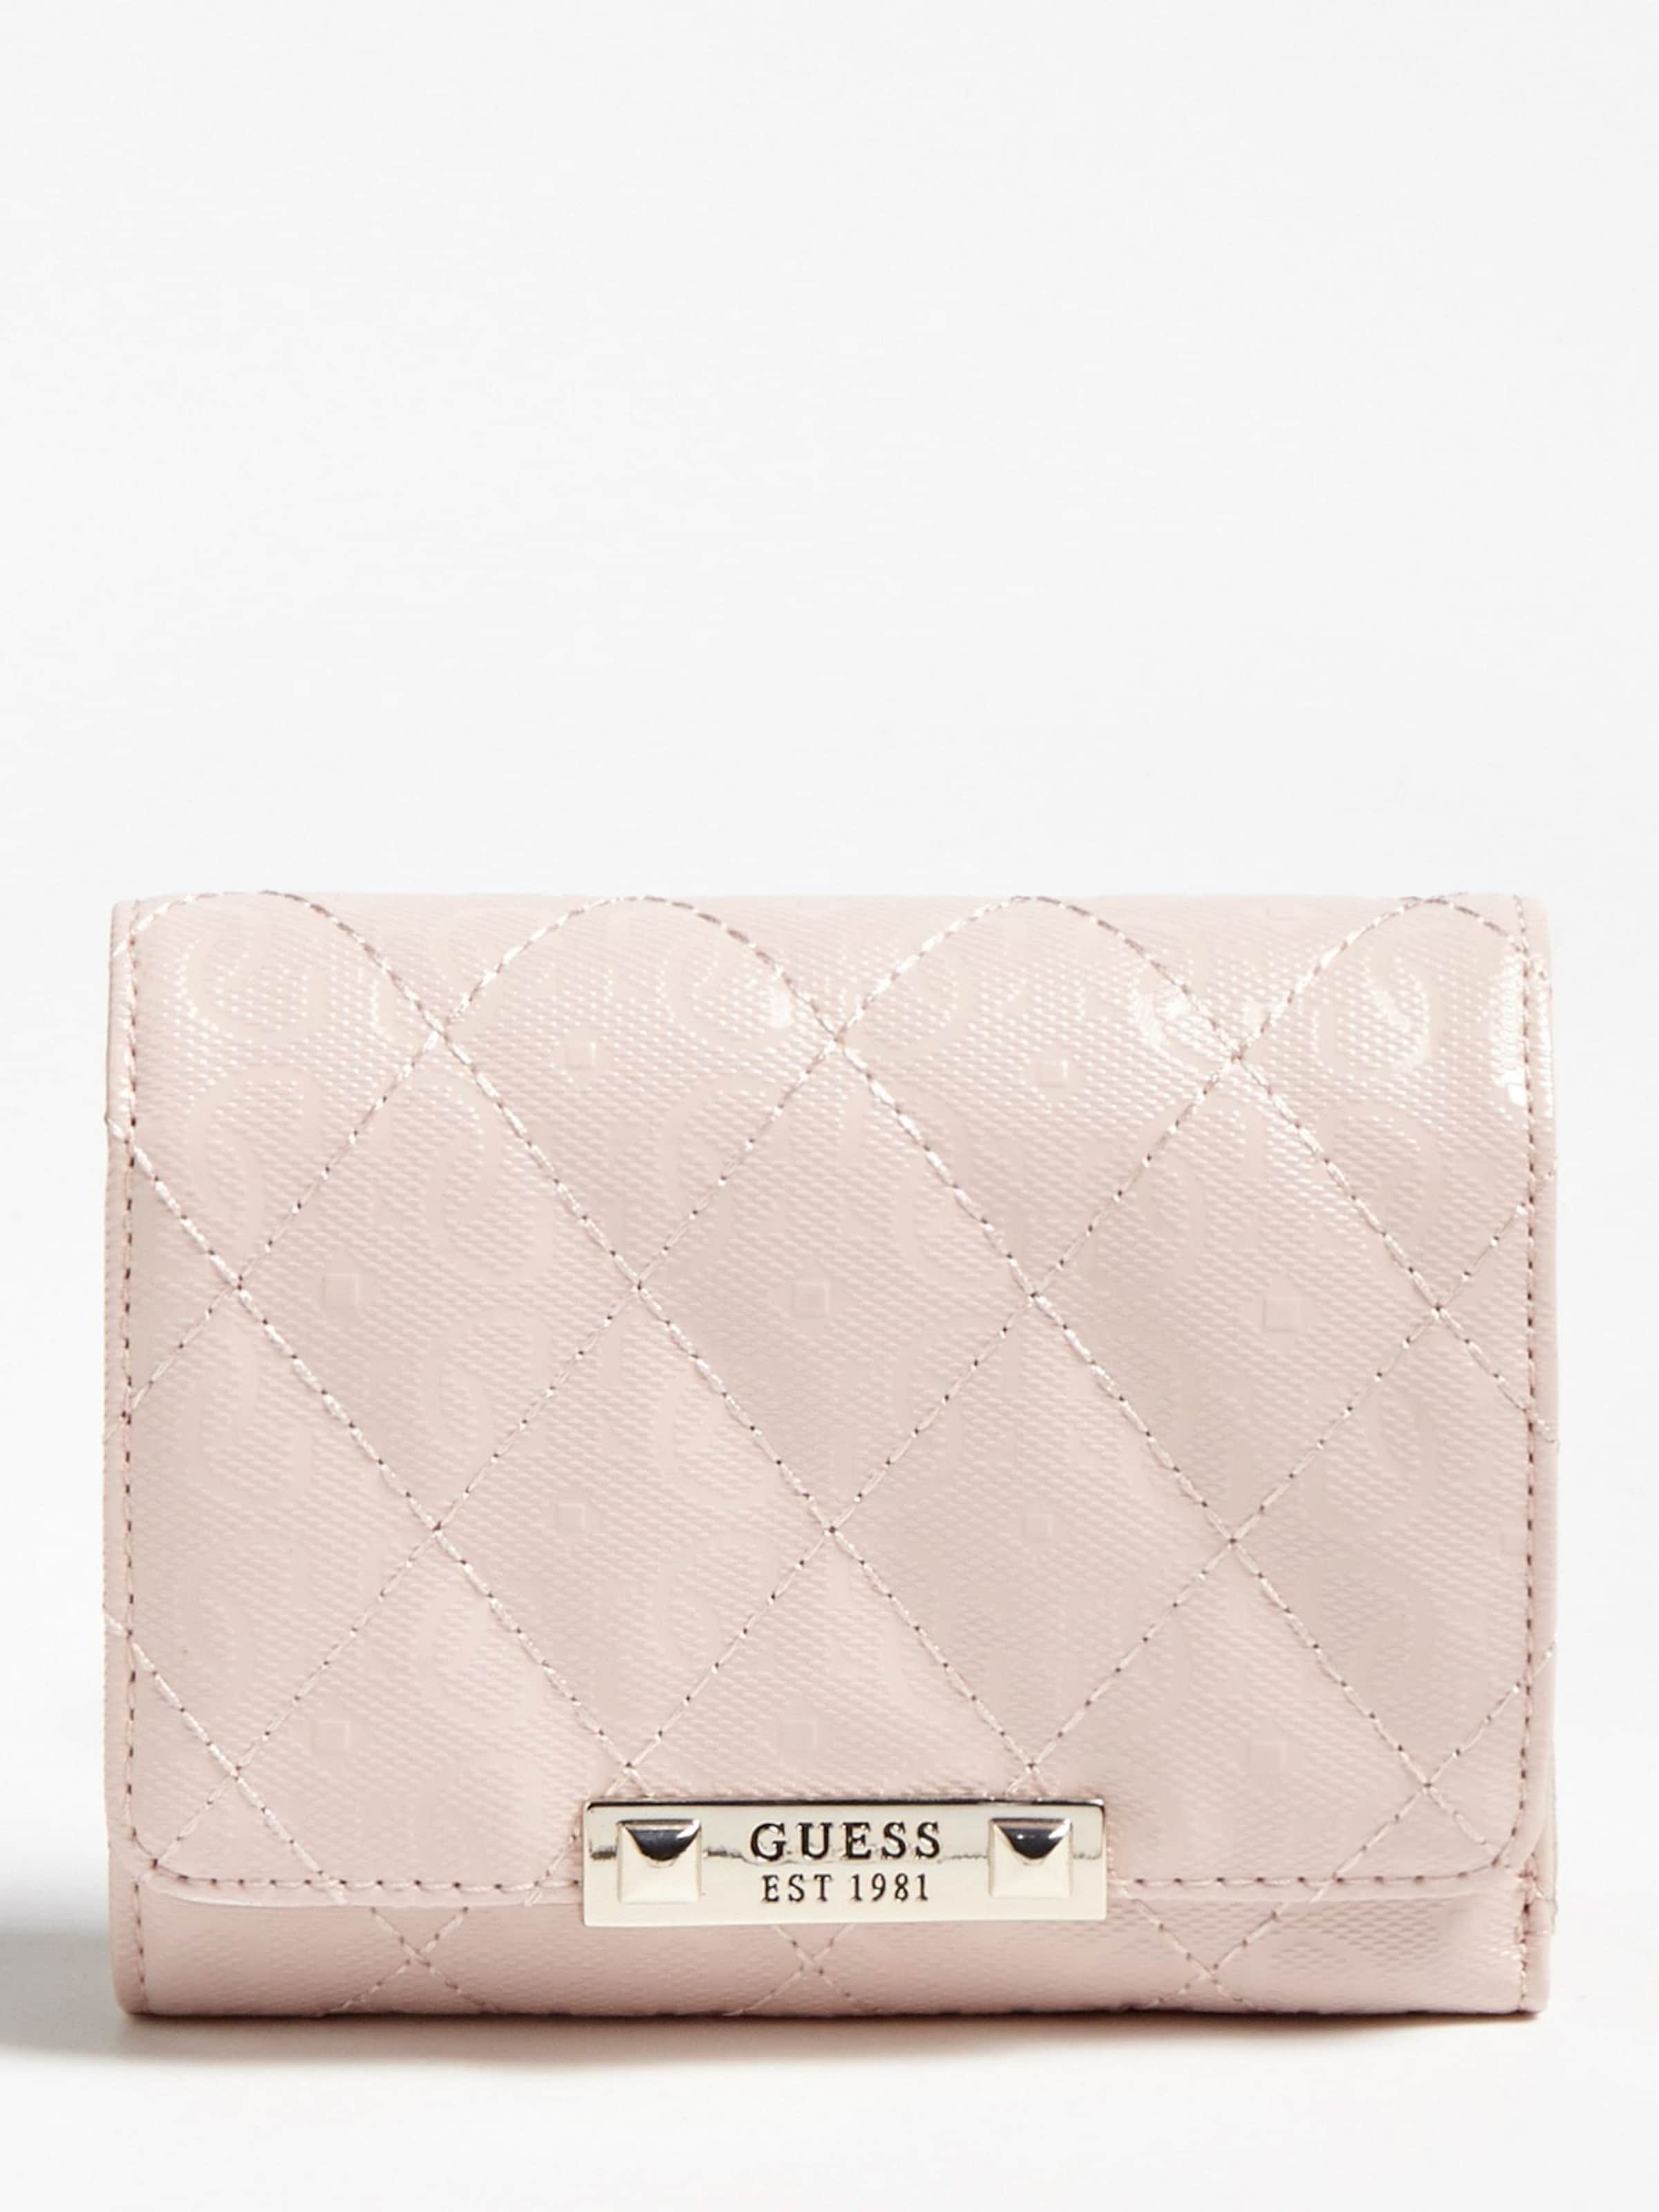 Portemonnaie Portemonnaie In 'tiggy' Guess 'tiggy' Pastellpink Guess Pastellpink In 4Aj53RL